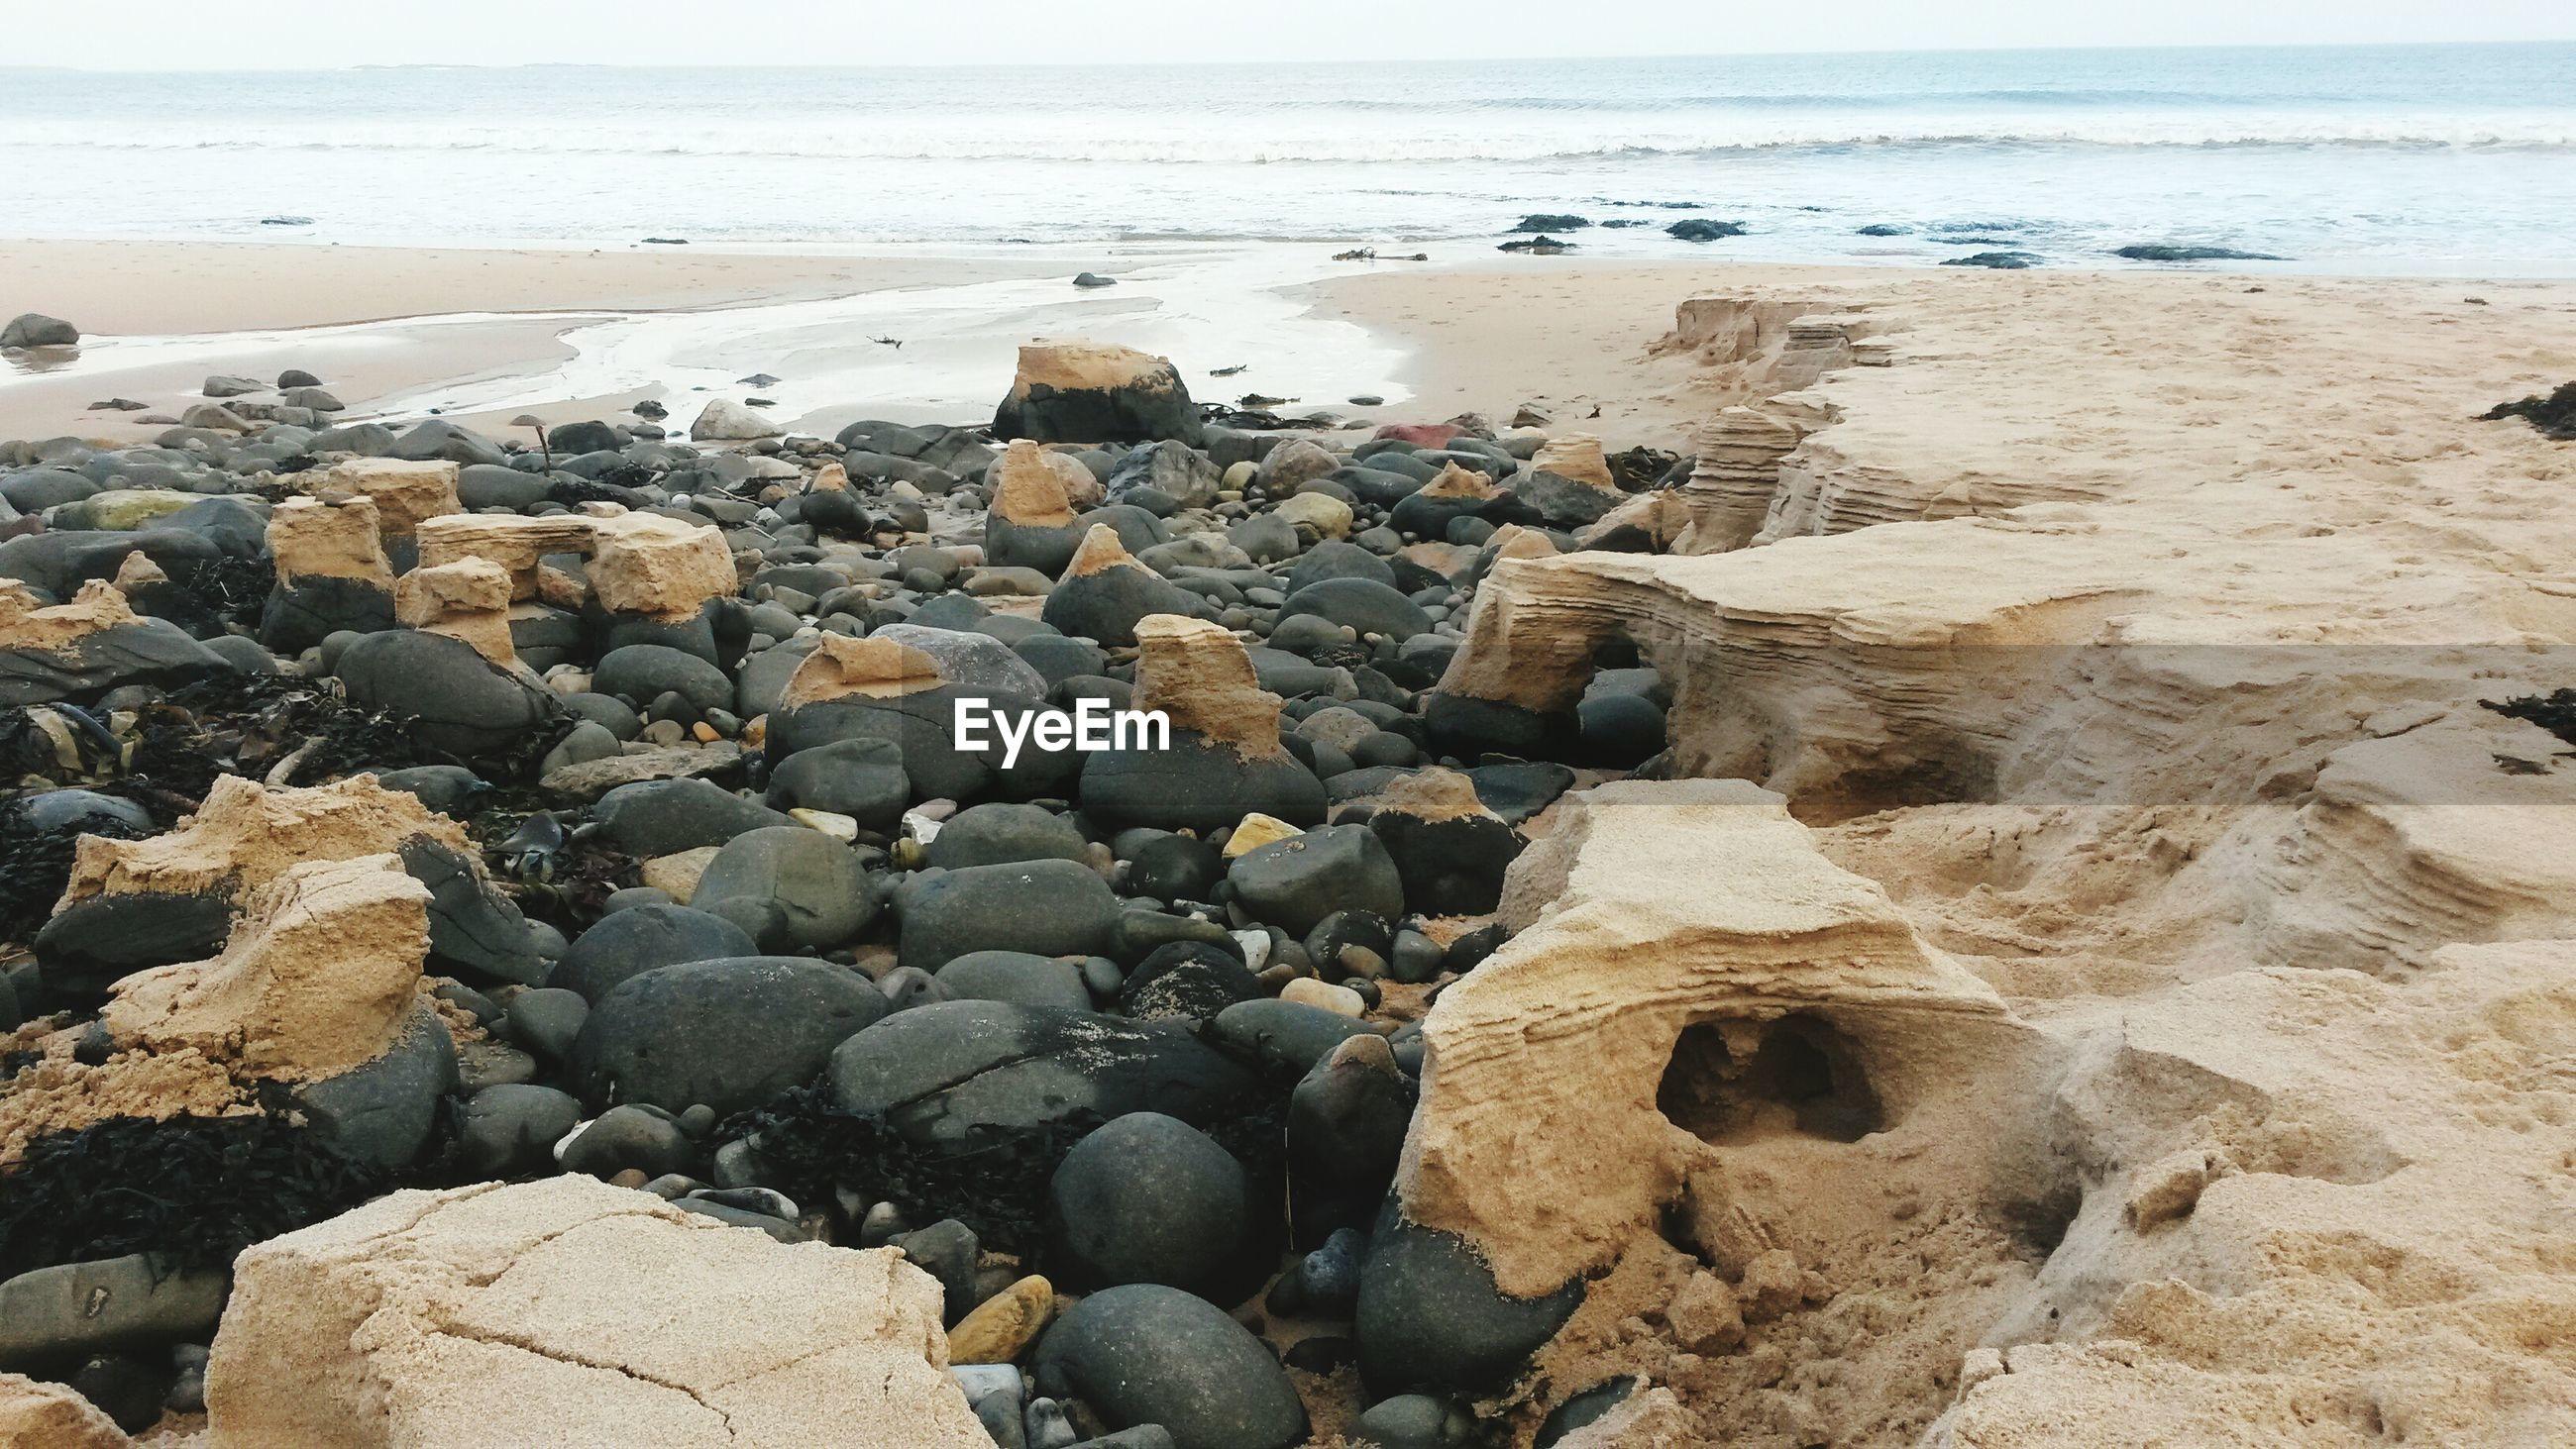 Surface level of rocks on beach